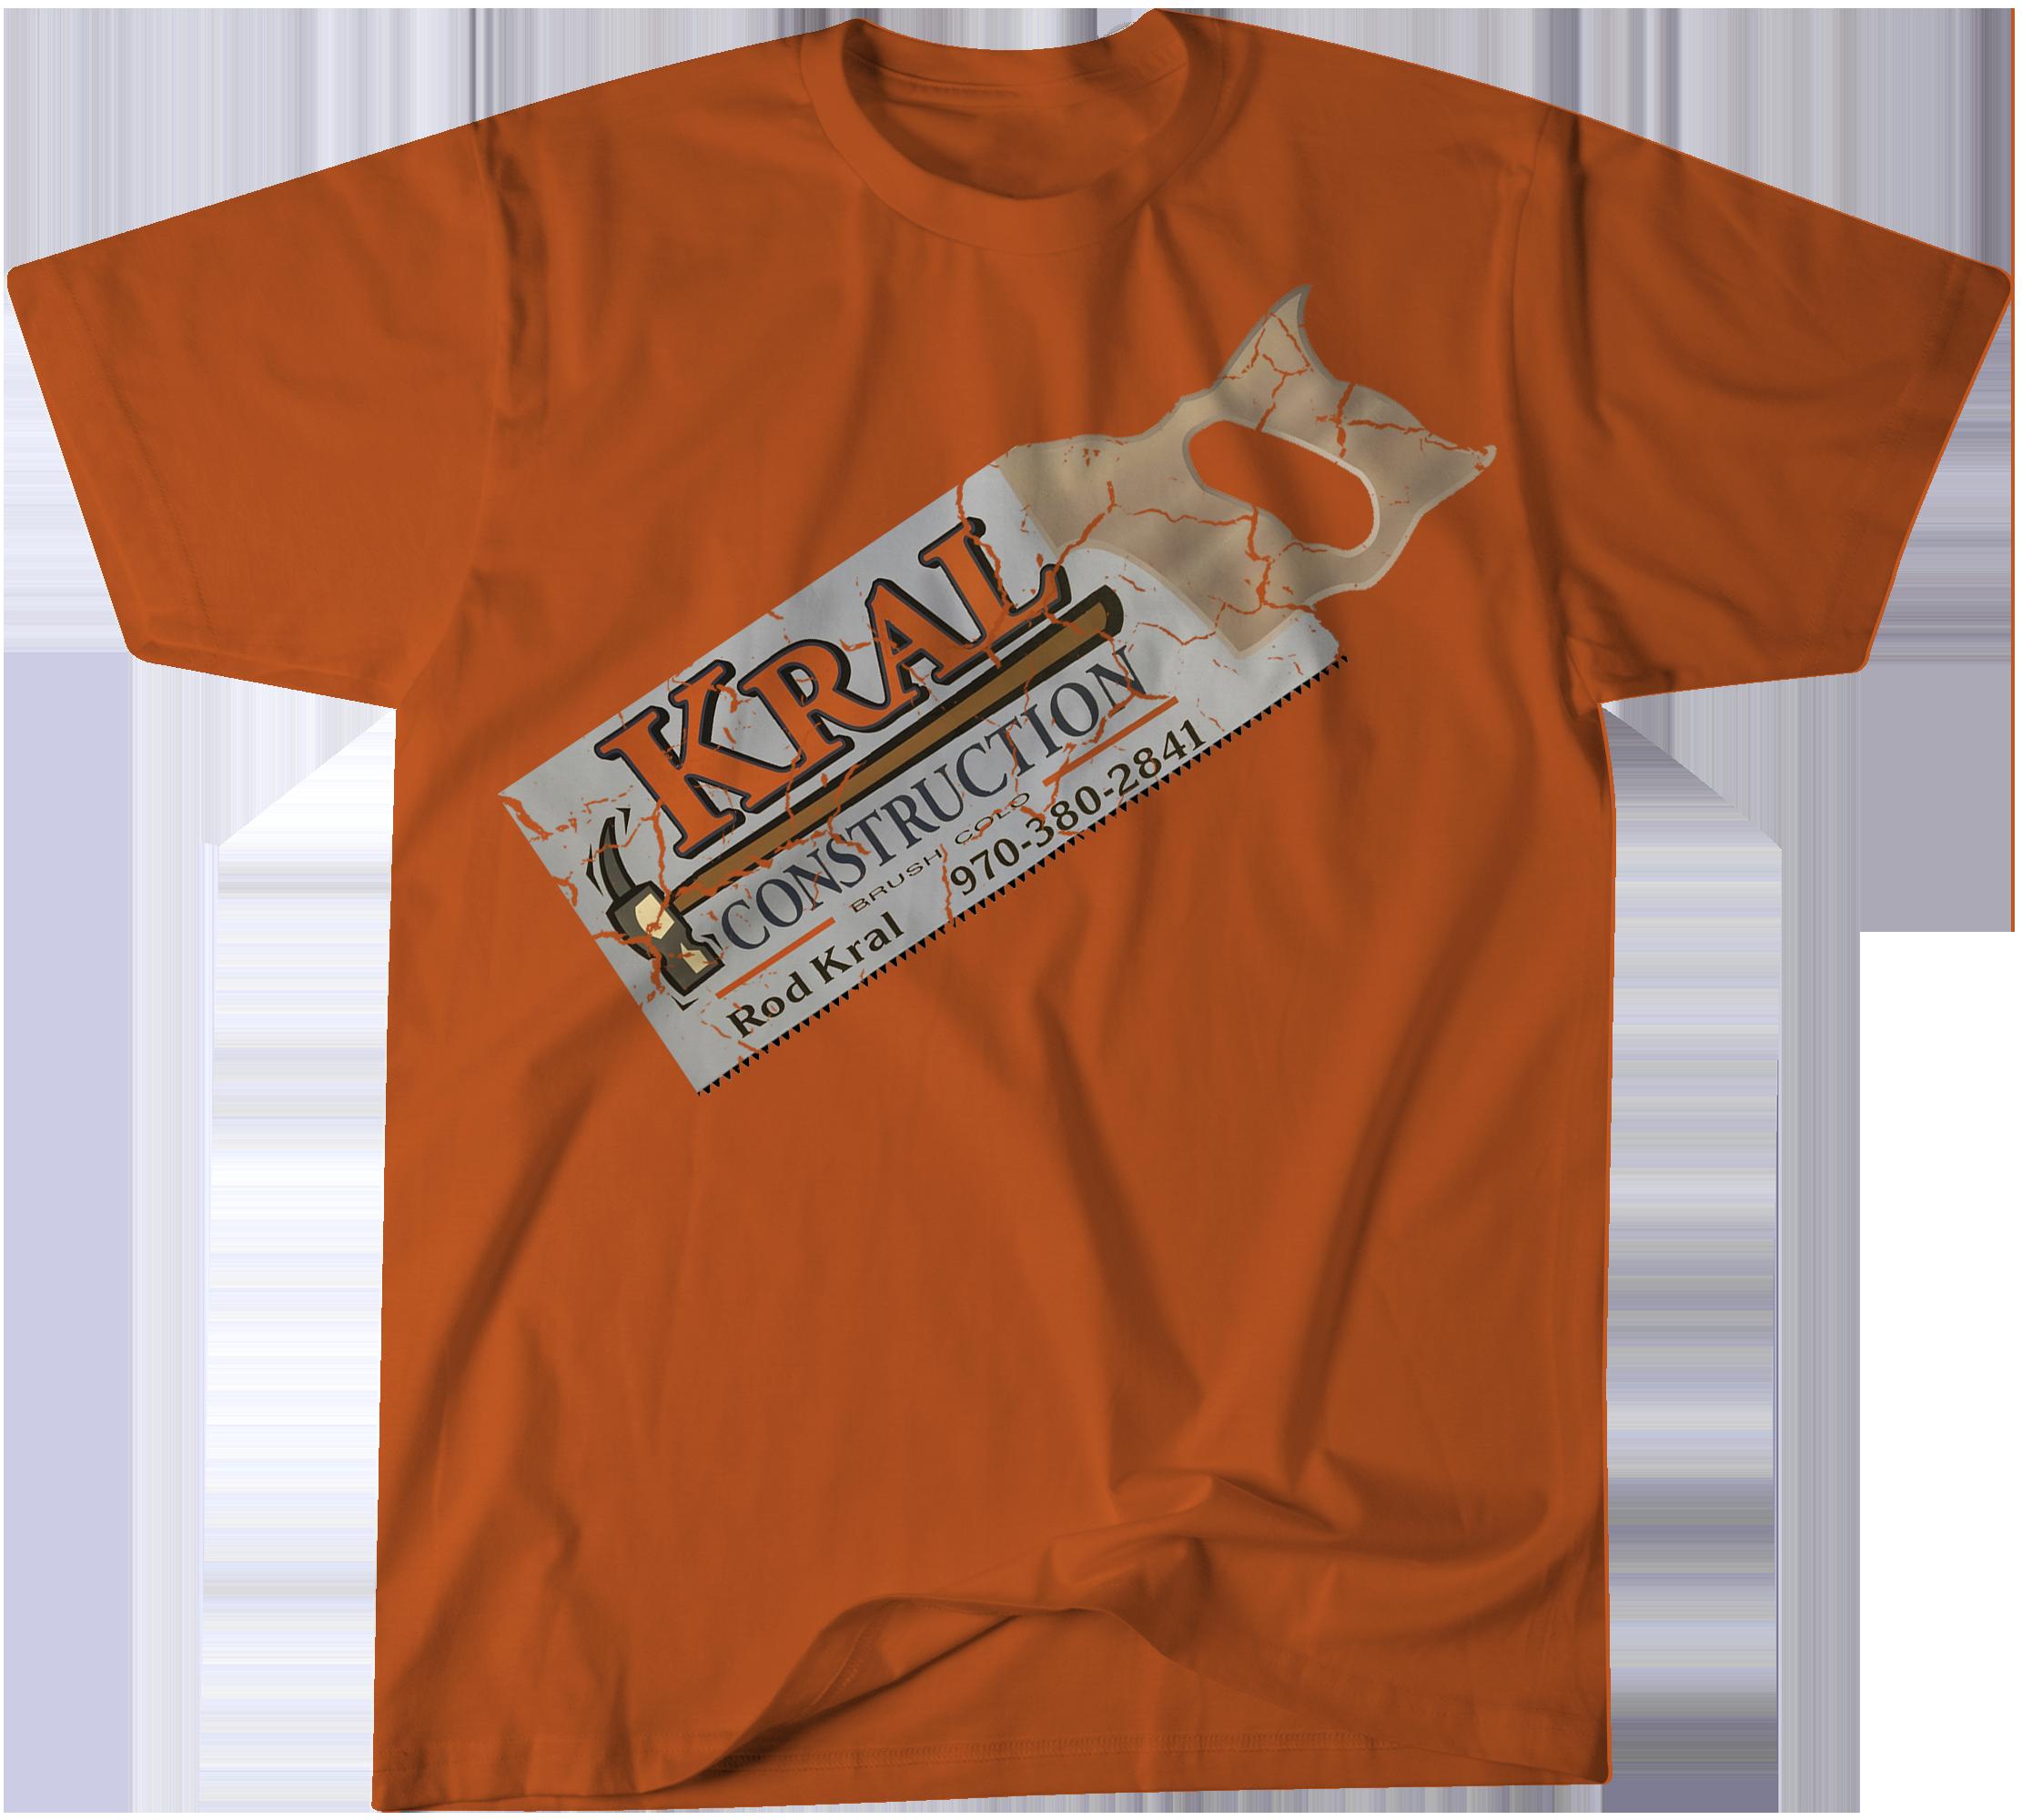 42052802-kral-construction-3.png